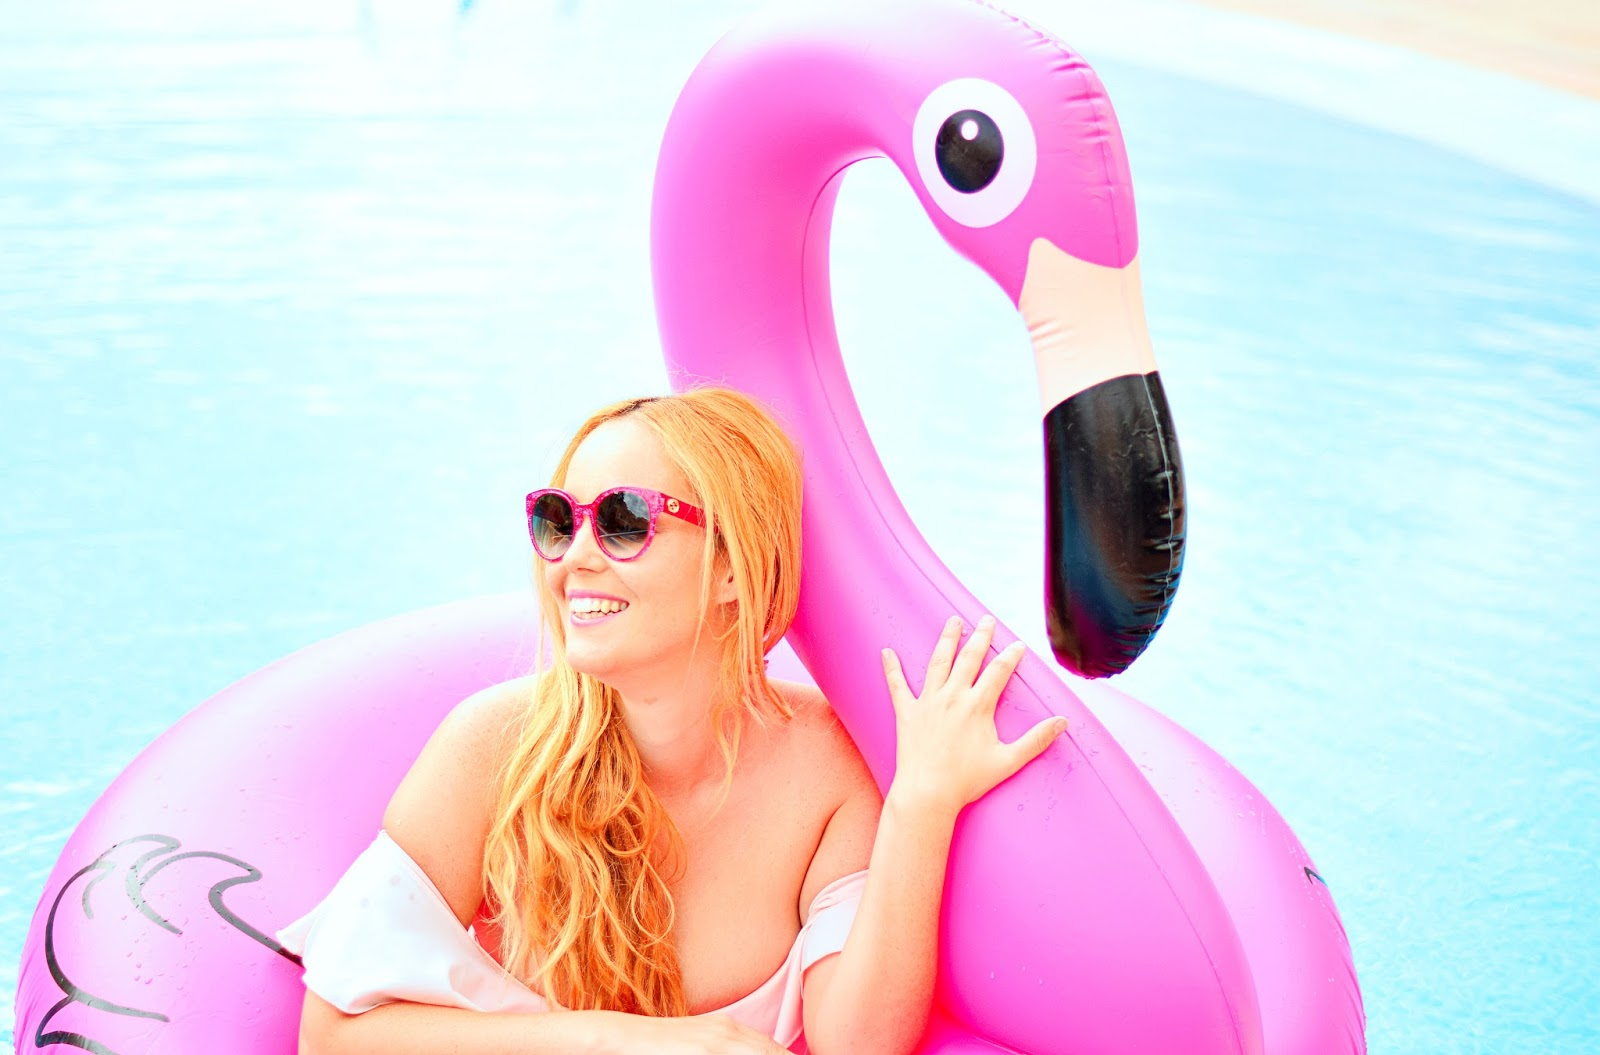 nery hdez, bikini volantes, opticalh, flotador flamenco, chicloth, summer look